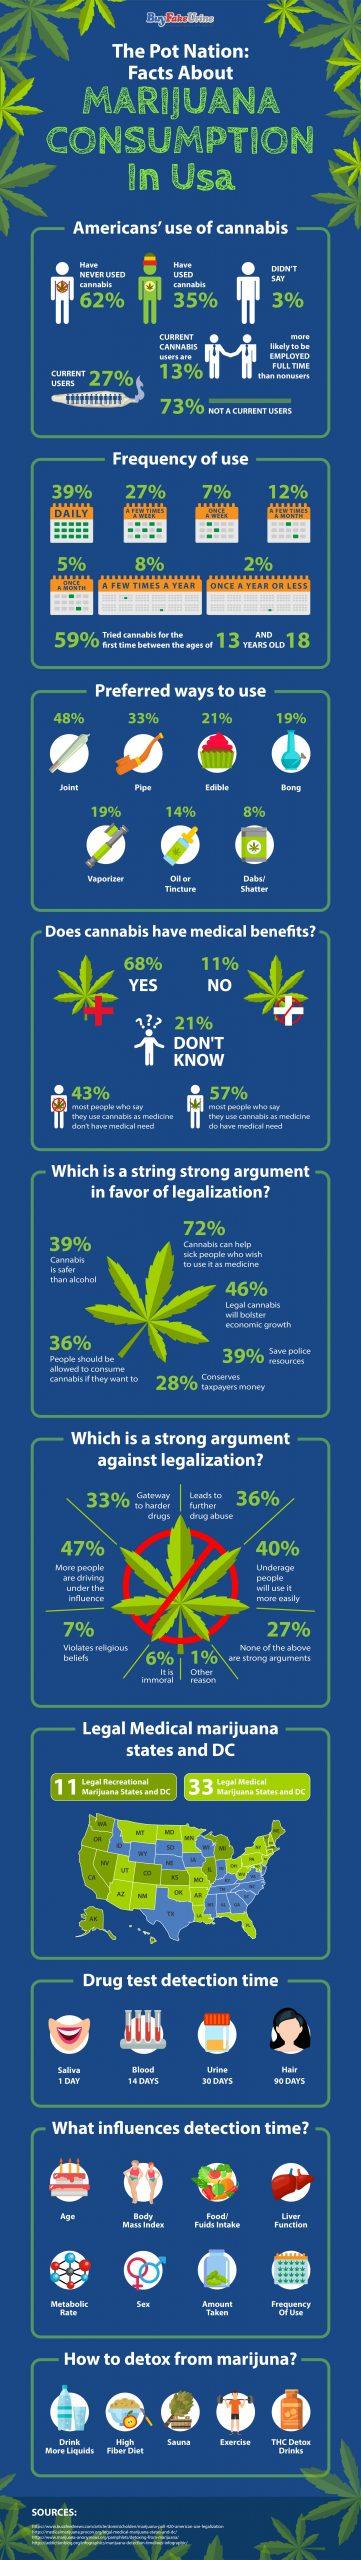 Facts_about_marijuana_consumption